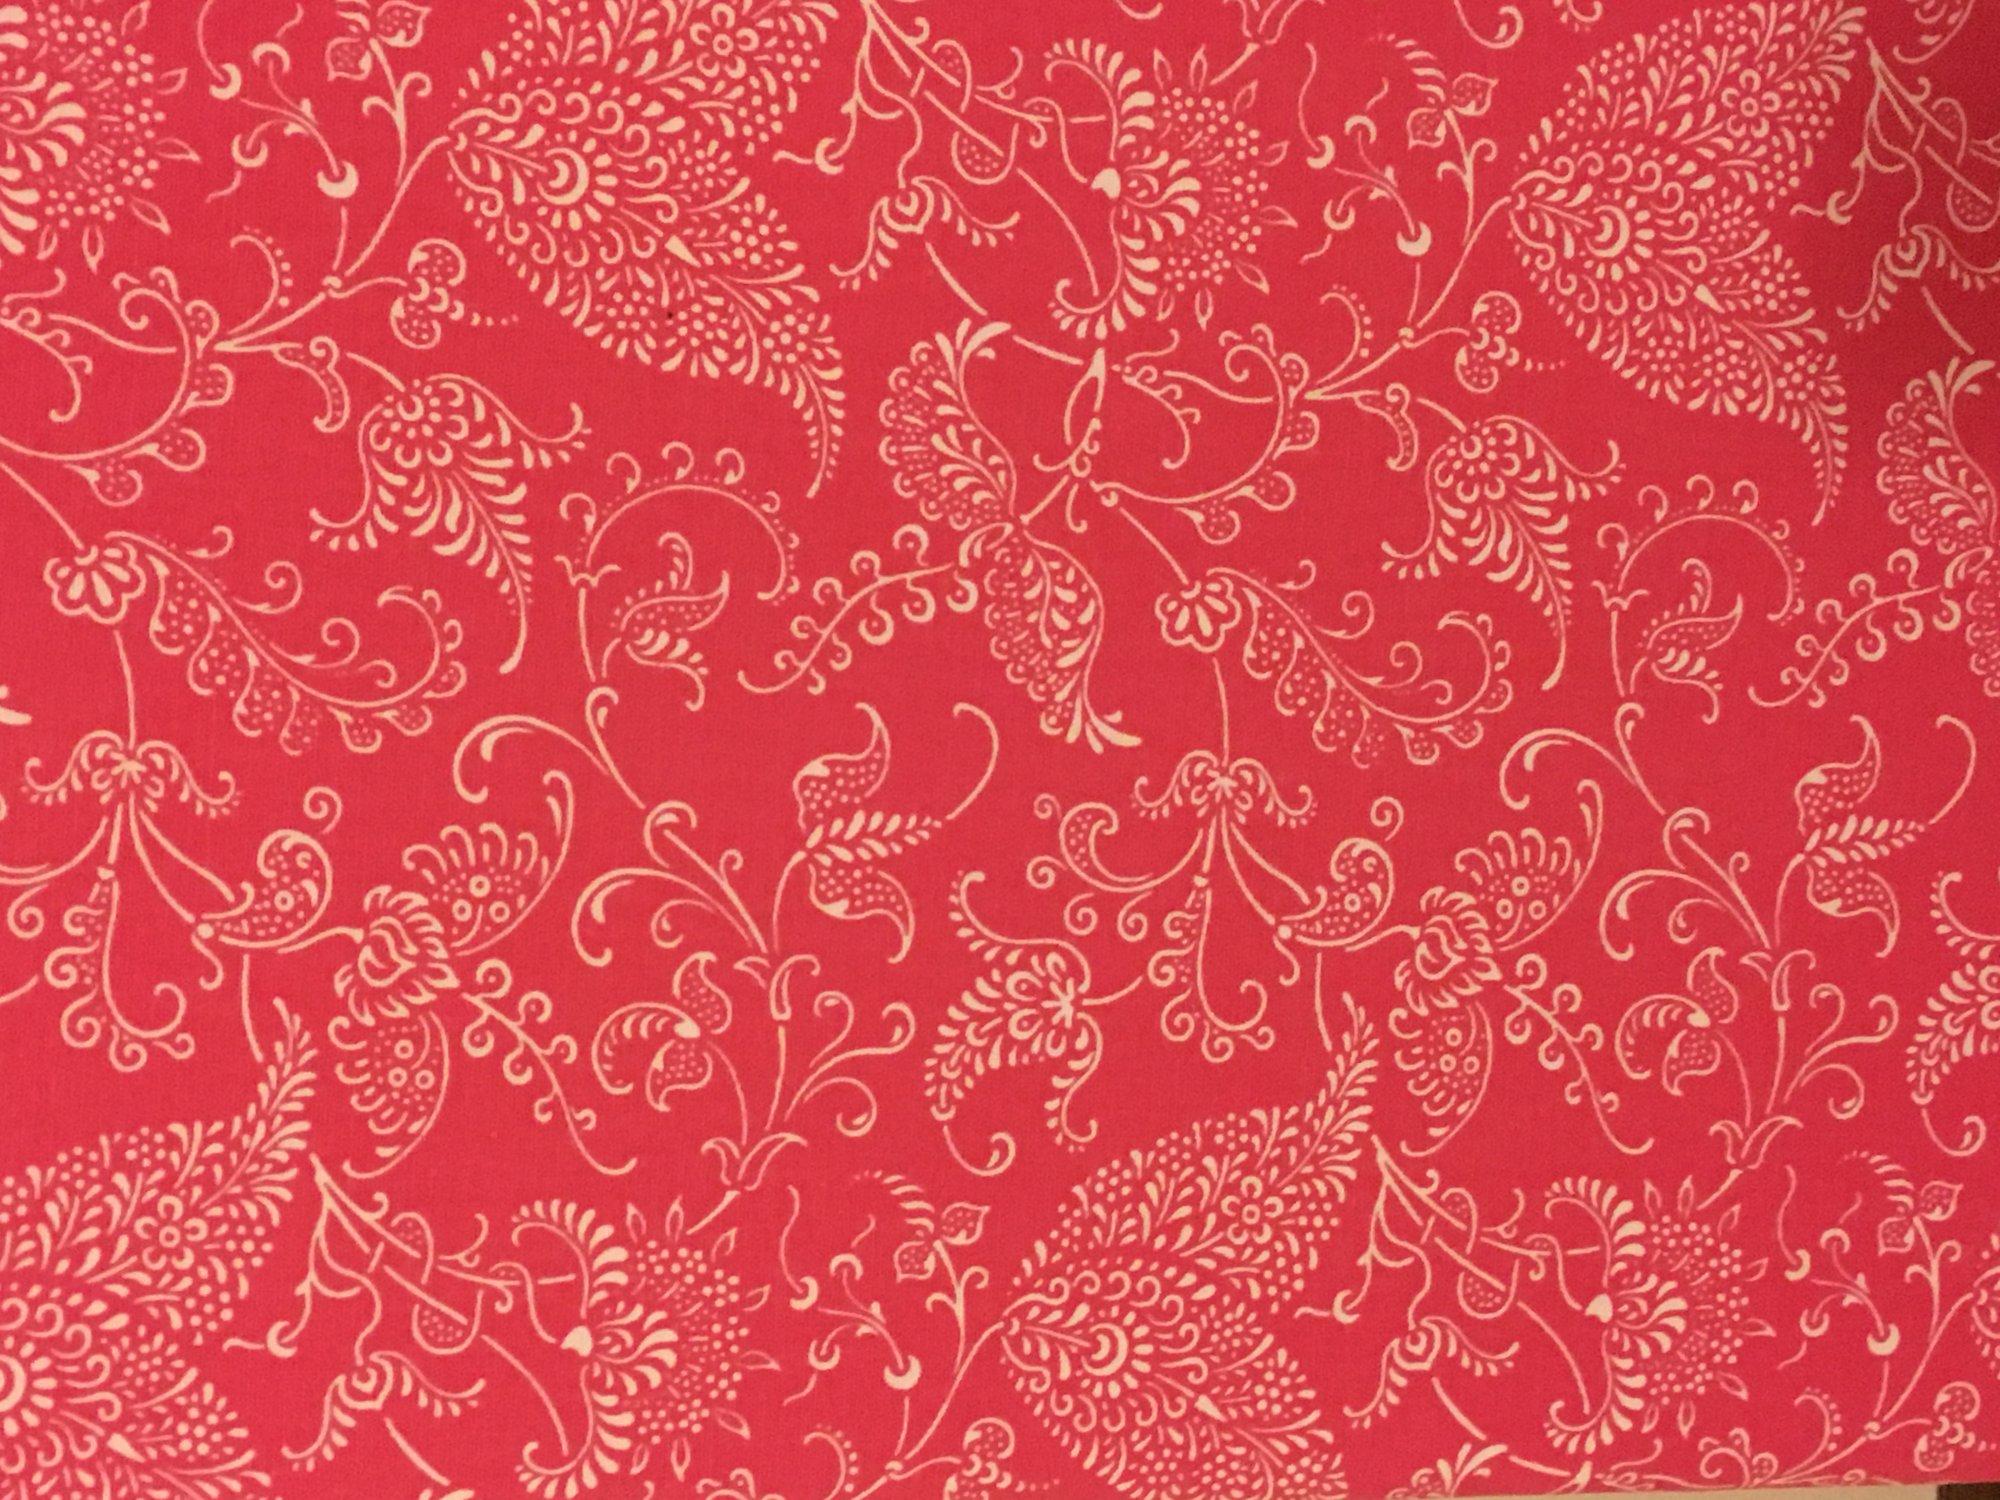 SQUARE BOARD - BRIGHTS Click for more fabric options